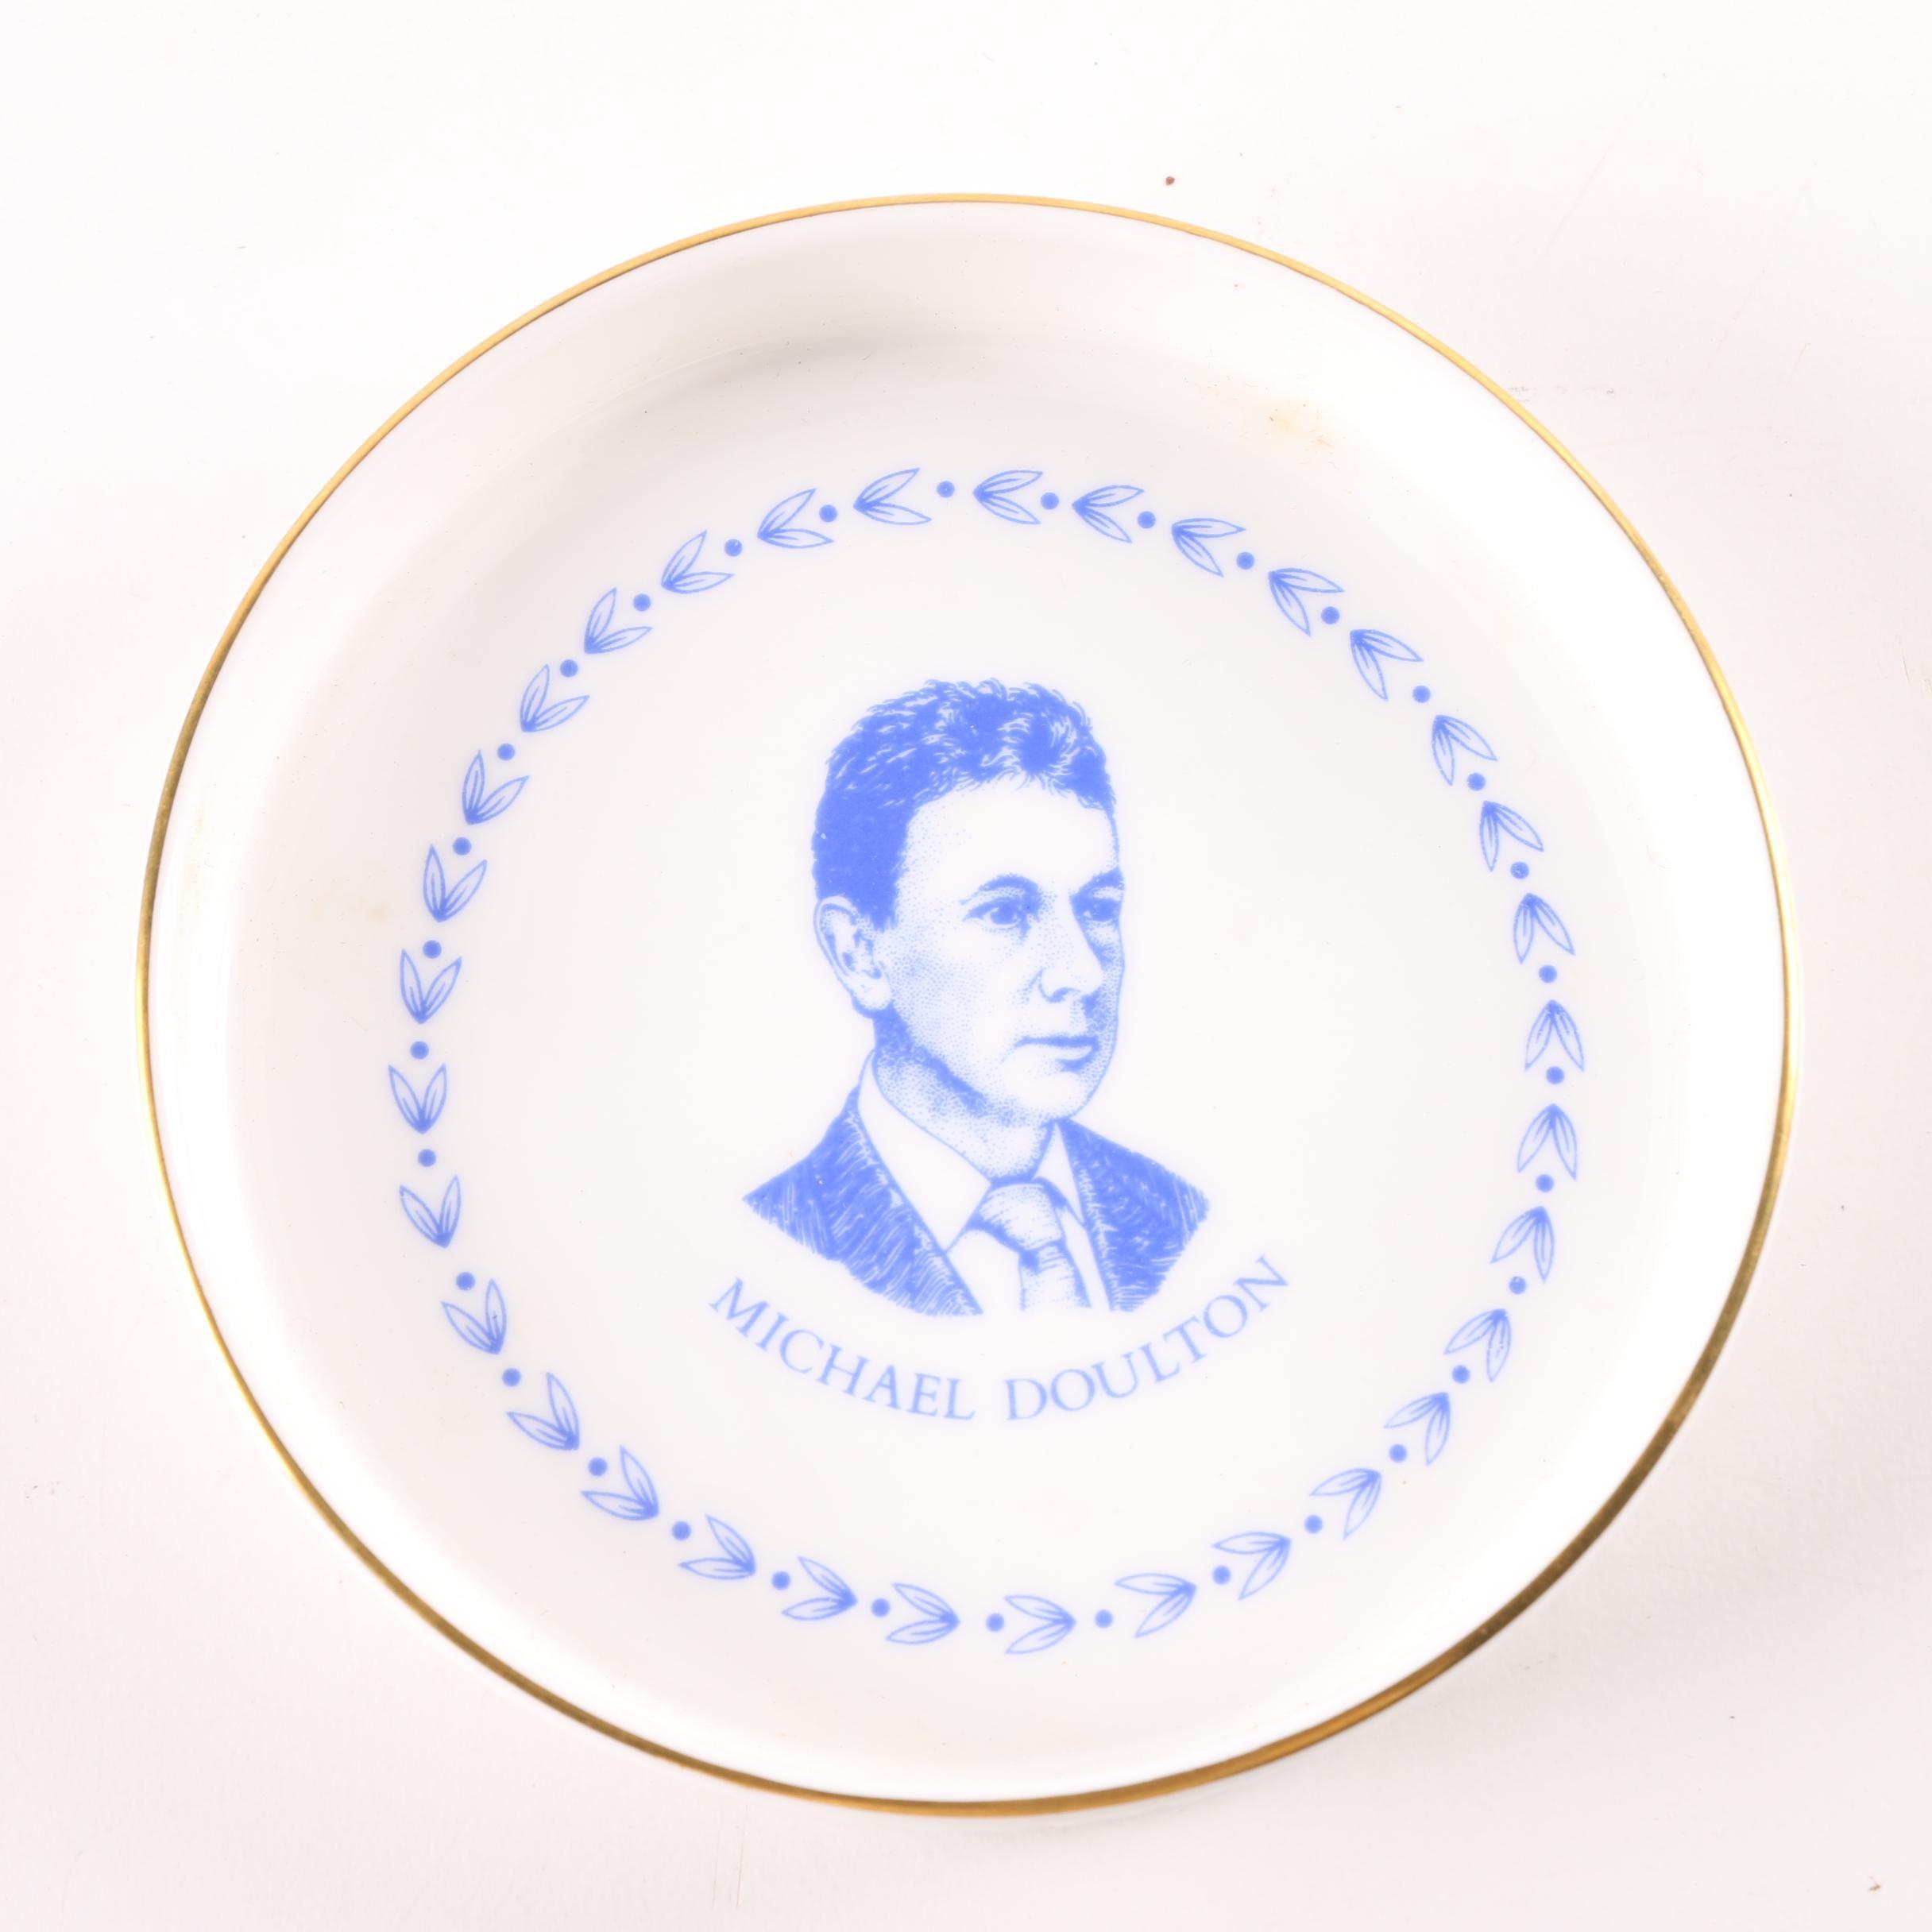 "Royal Doulton ""Michael Doulton"" Porcelain Dish"